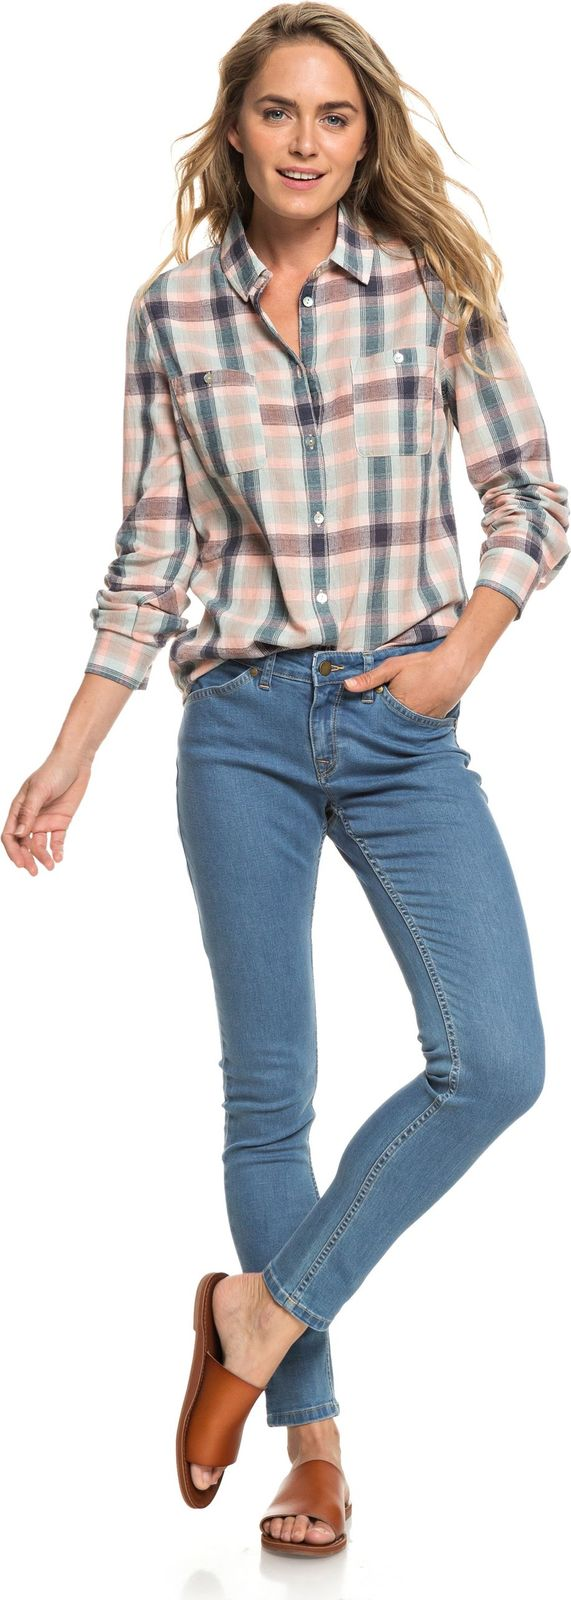 Рубашка Roxy Setai Miami 2